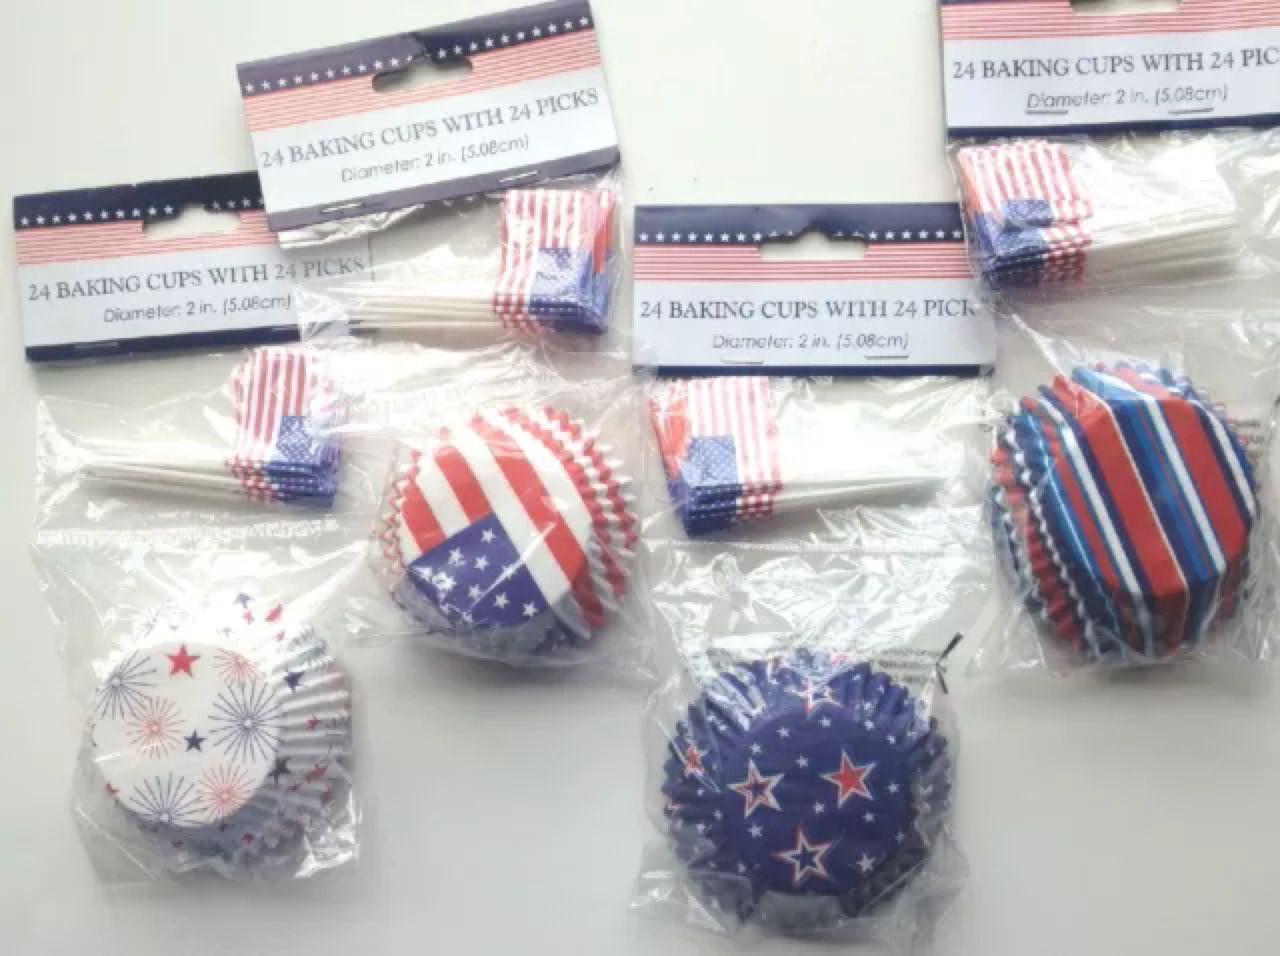 48 Pc Cupcke Baking Cups & Matching Picks: Patriotic Decorations NEW ...